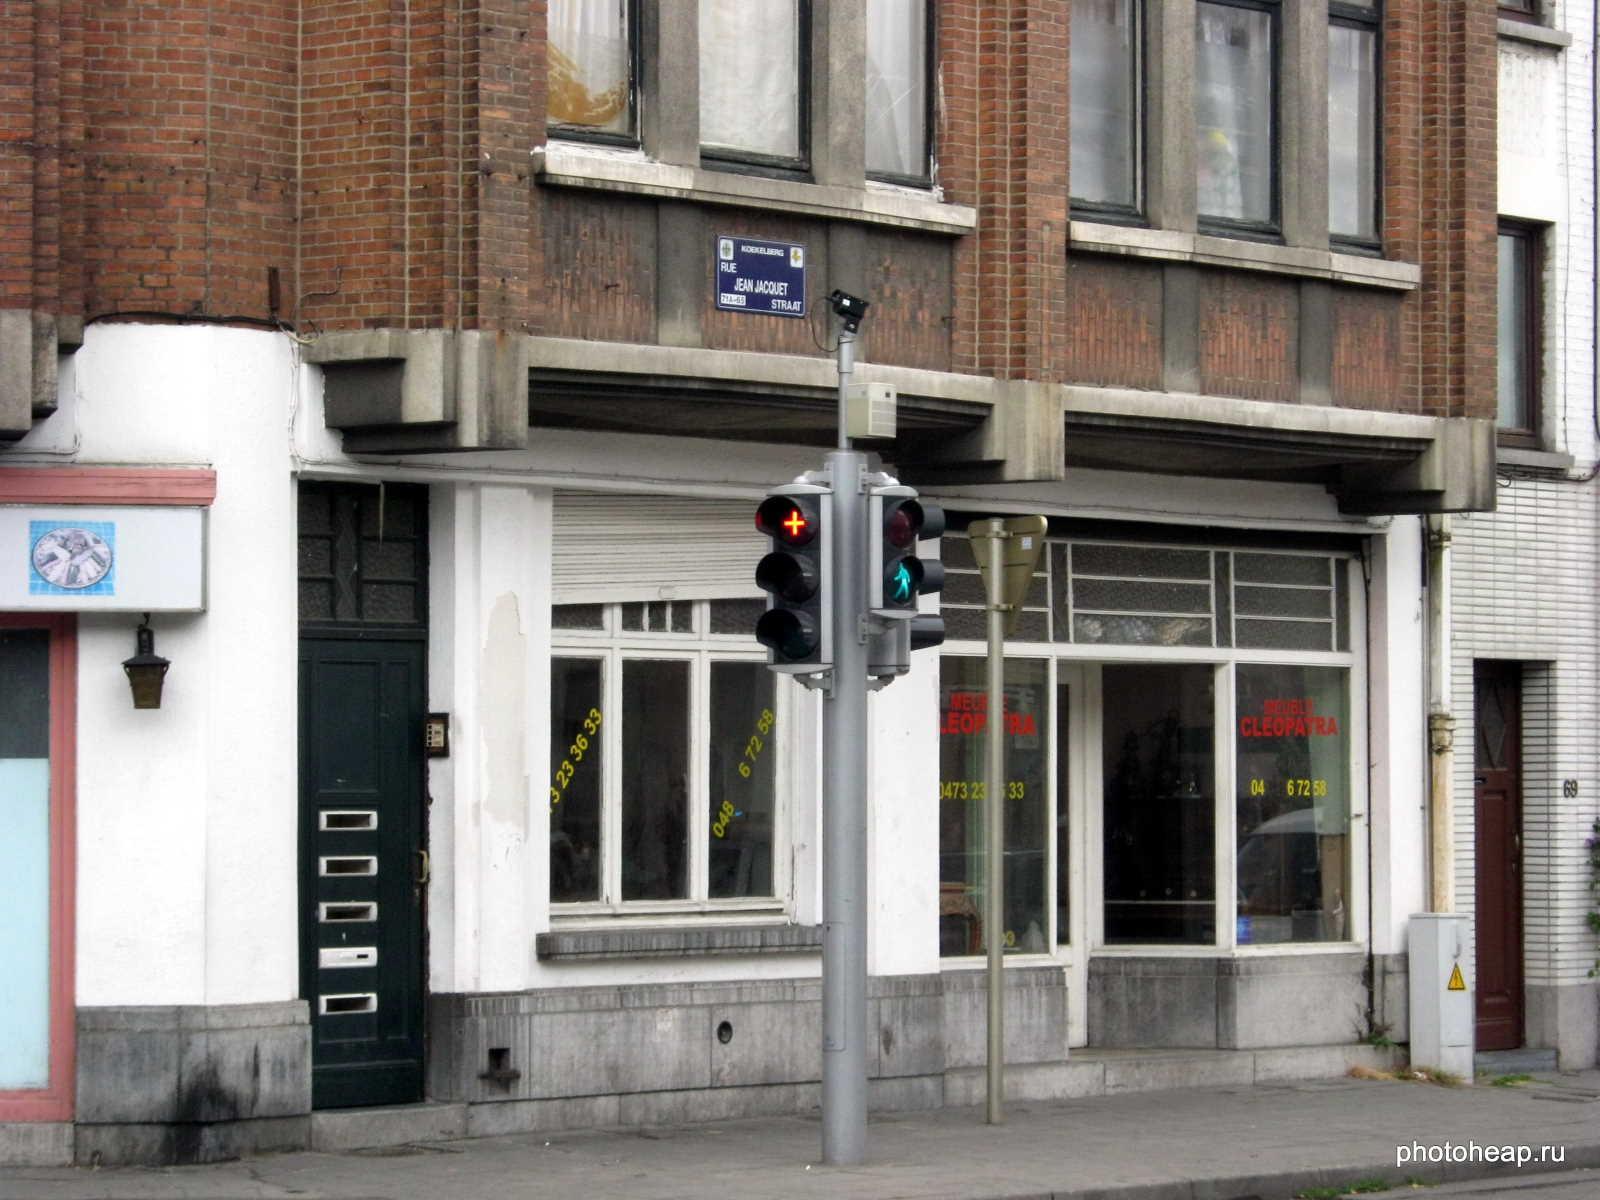 Brussels - Red cross traffic lights